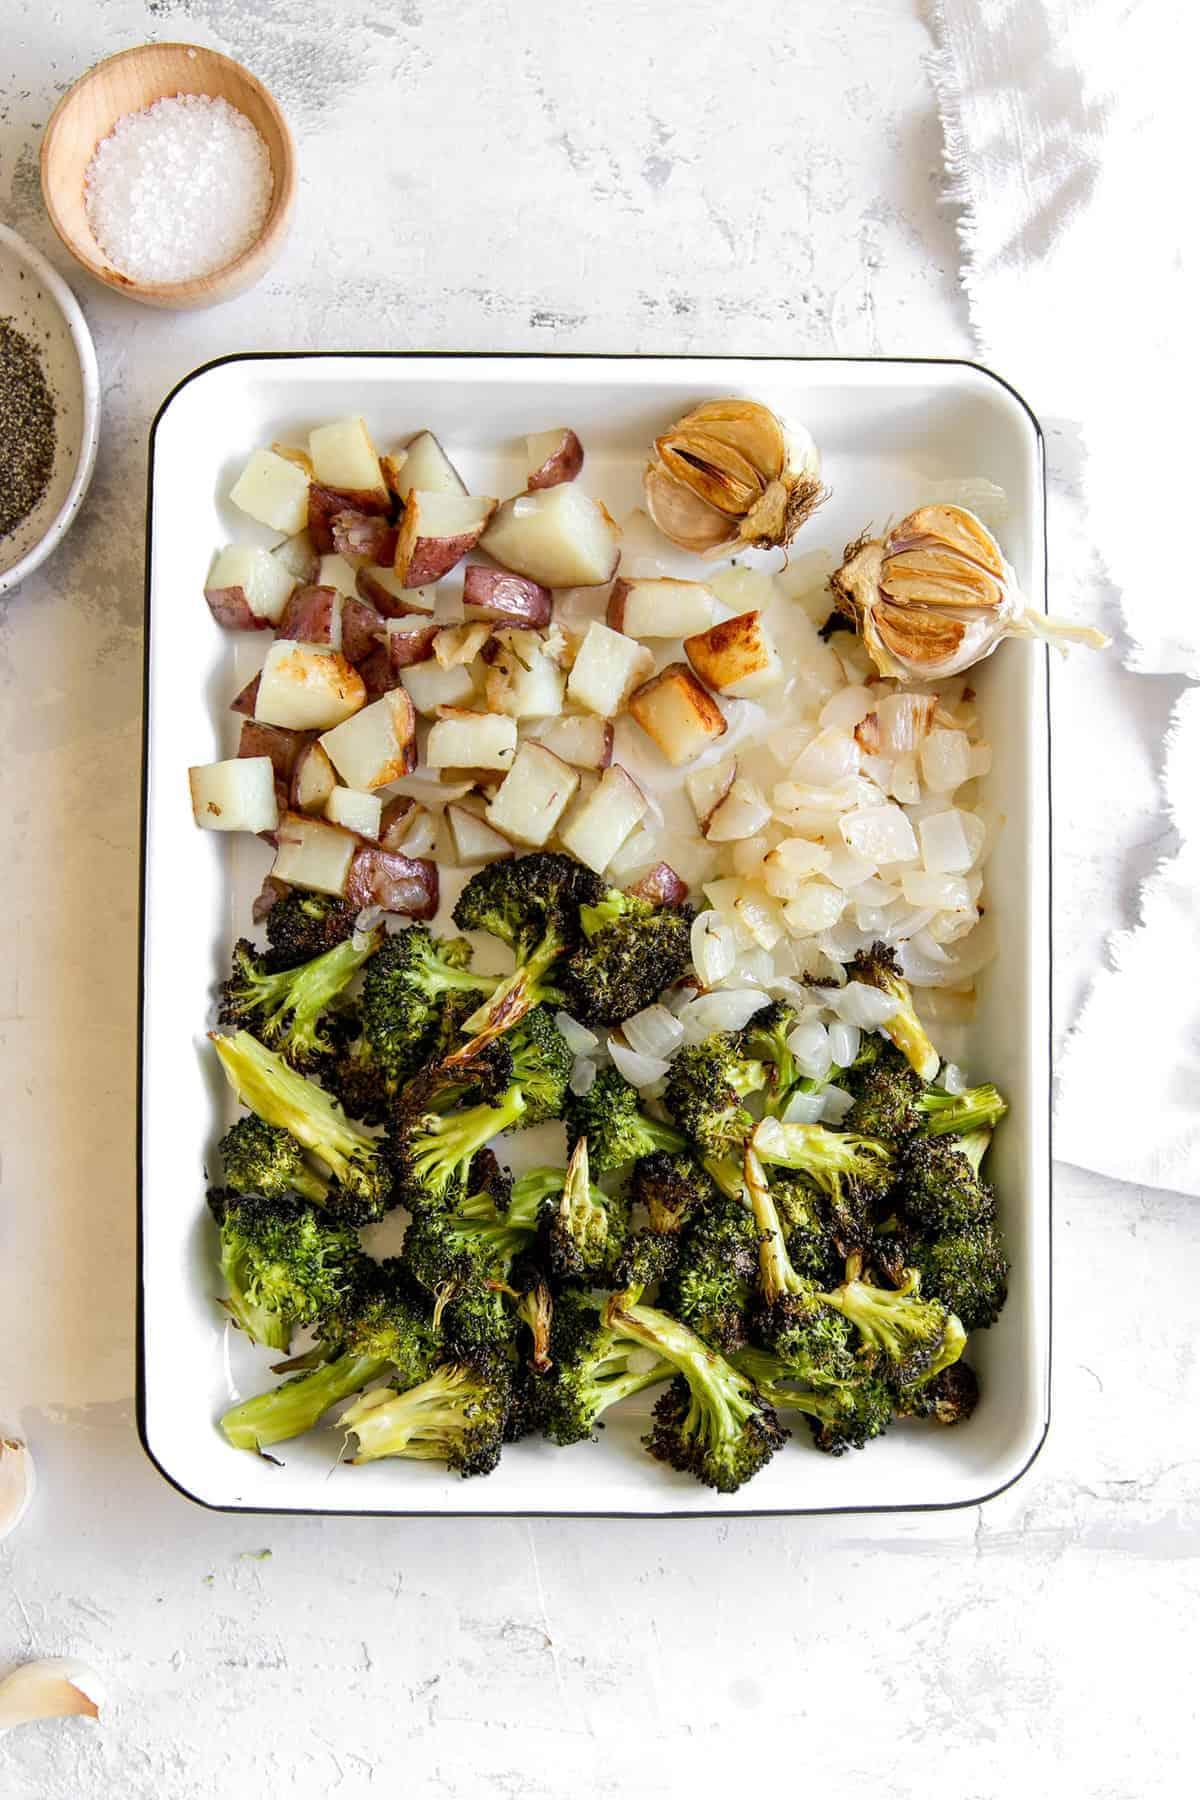 Roasted vegetables in a roasting pan.